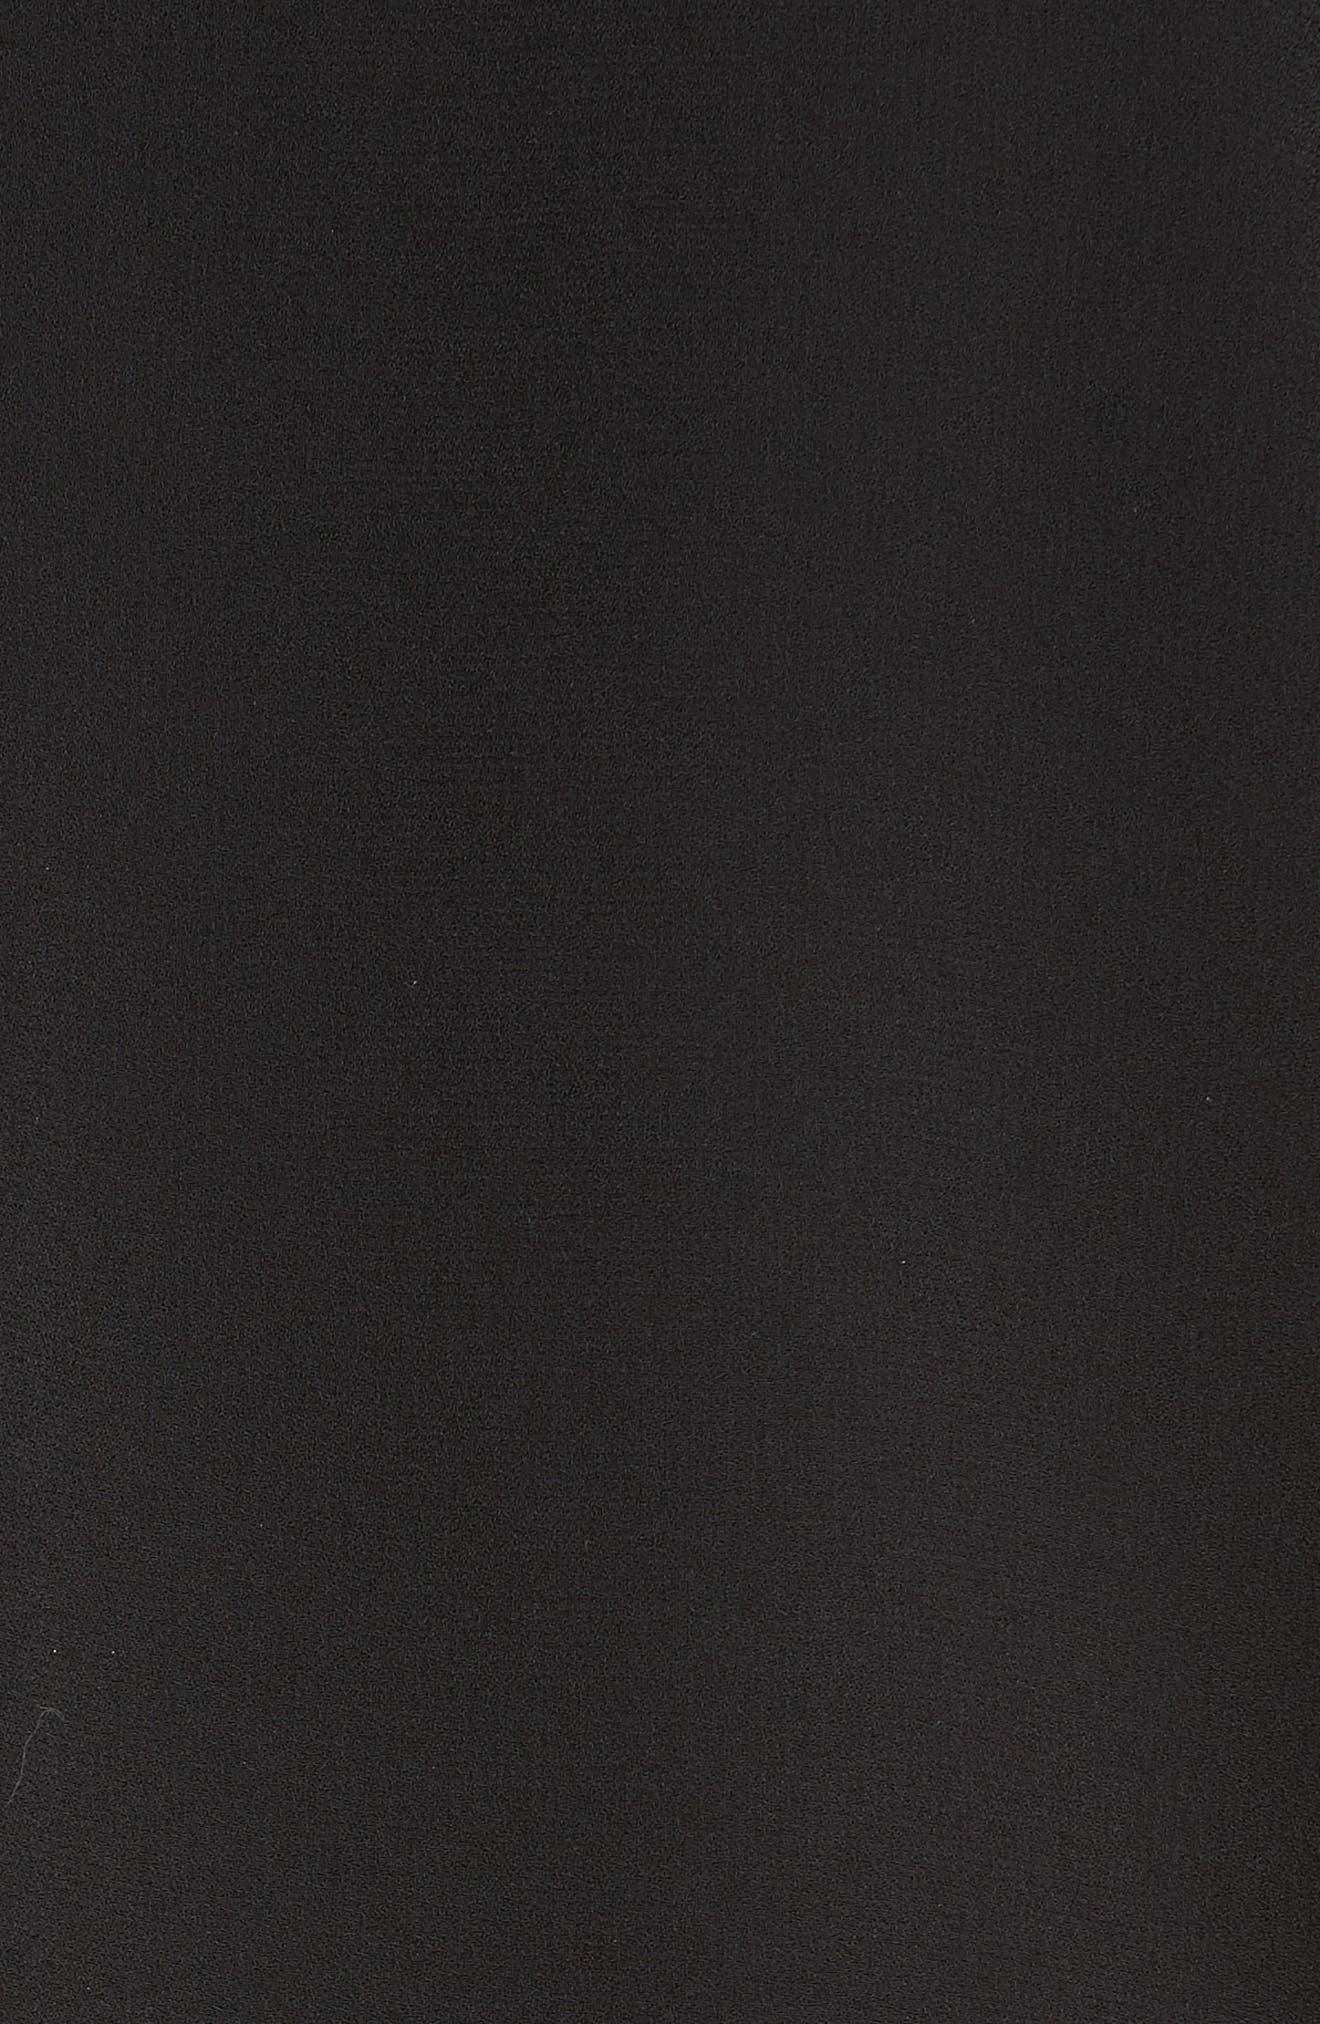 Satin Back Crepe Jumpsuit,                             Alternate thumbnail 5, color,                             001